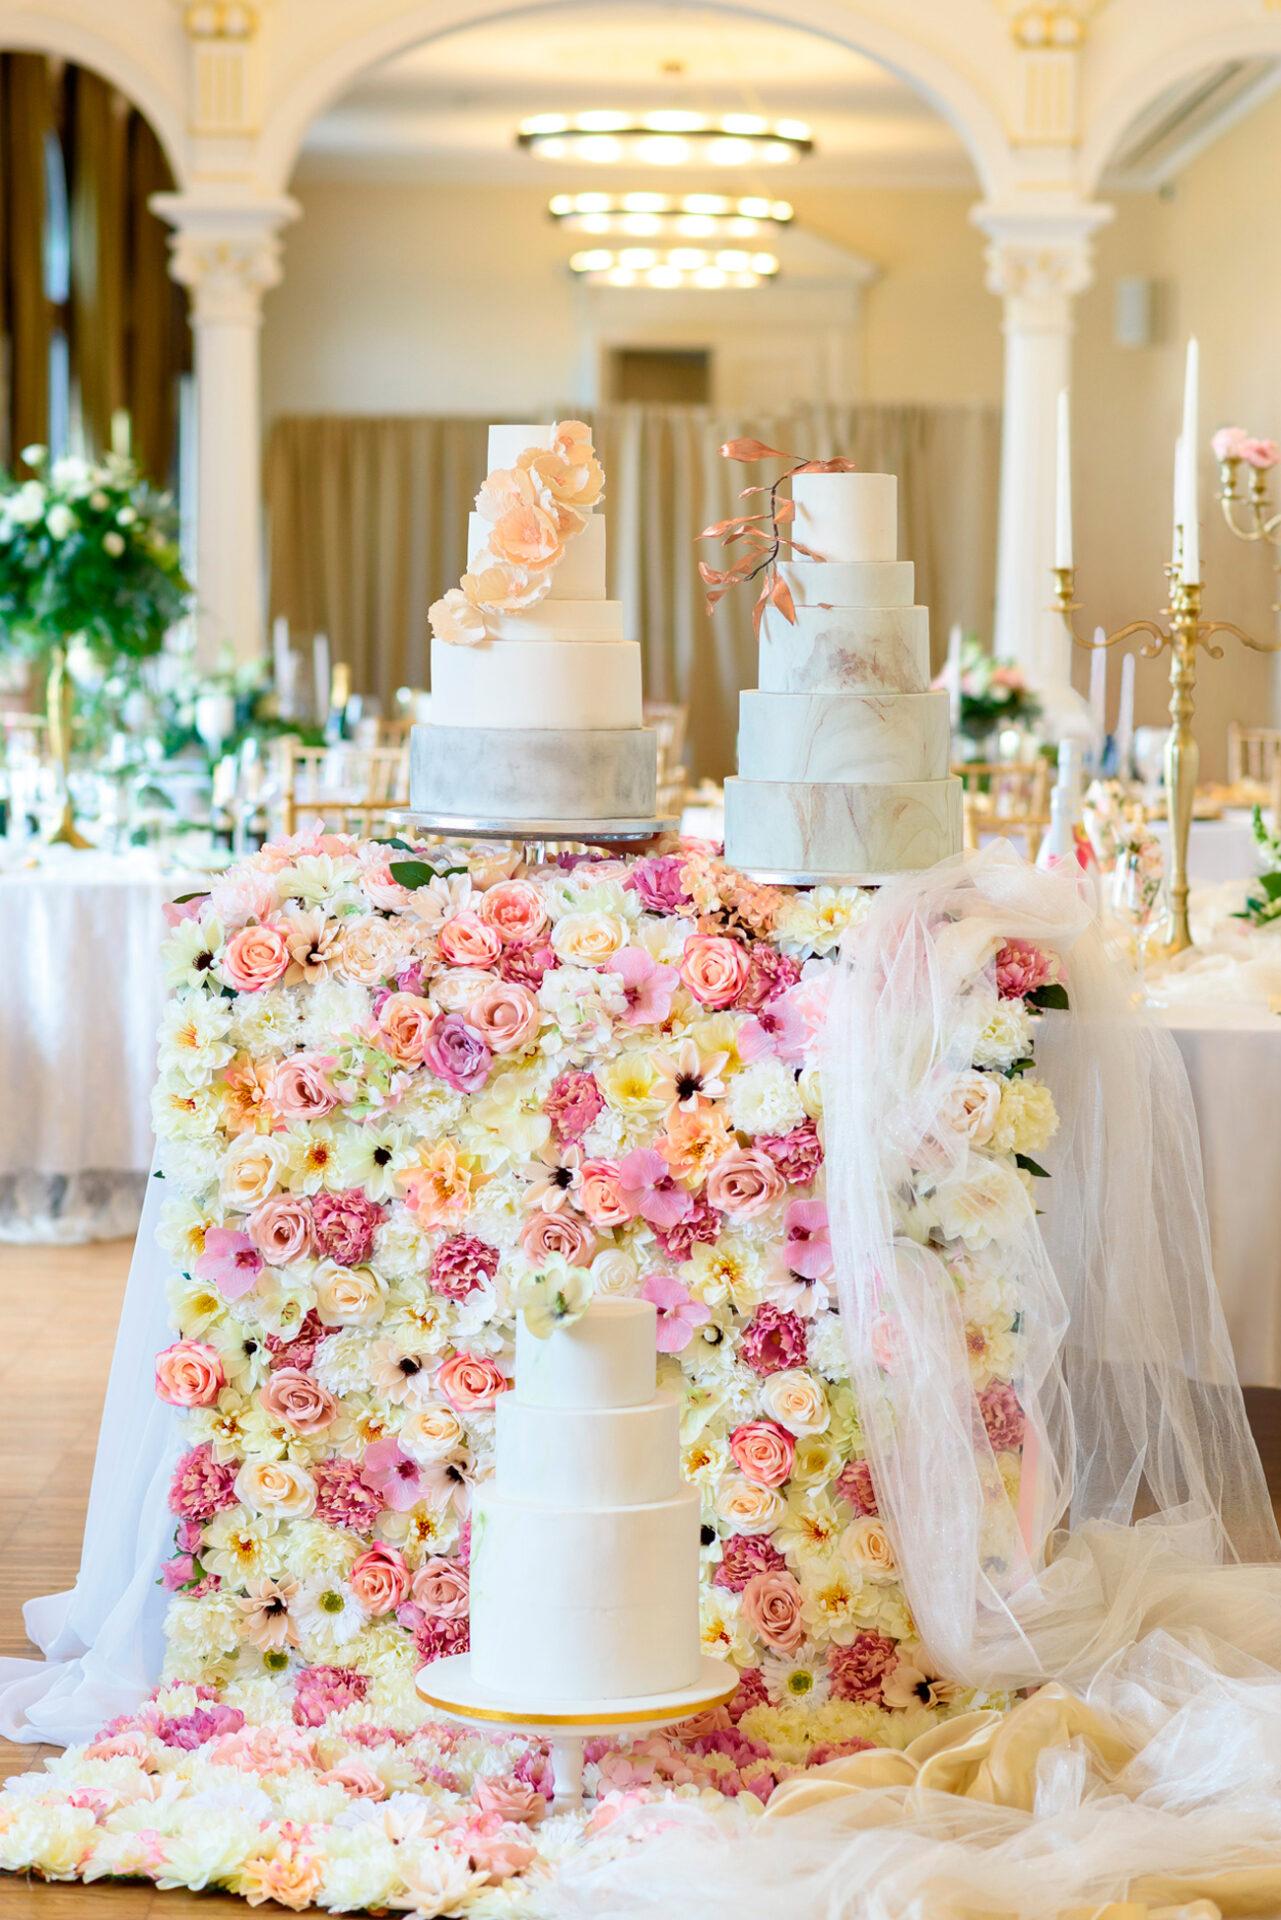 Esküvői torta - Tortapalota